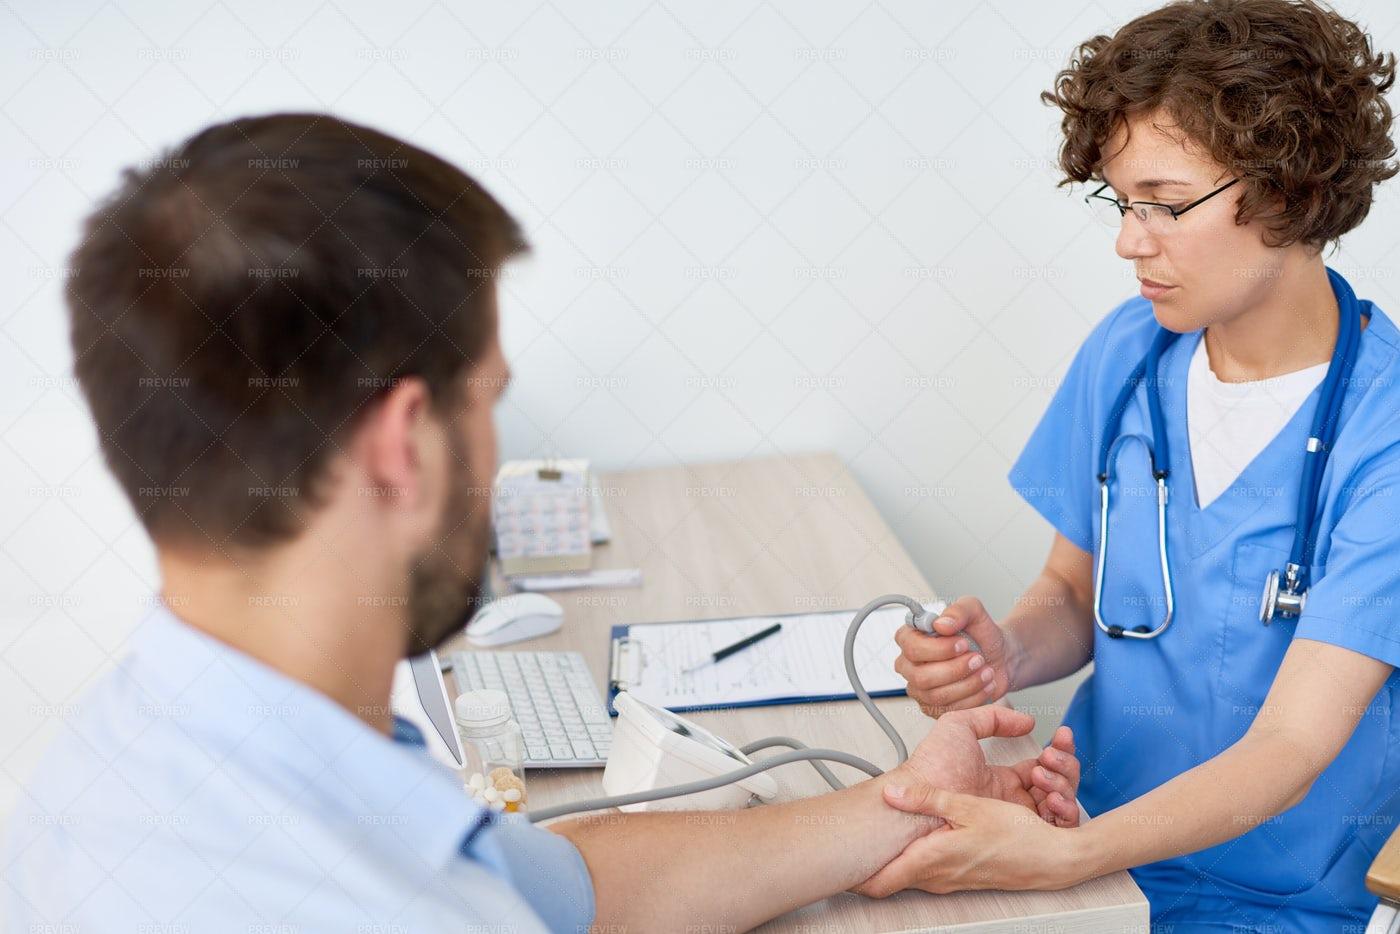 Nurse Measuring Blood Pressure For...: Stock Photos